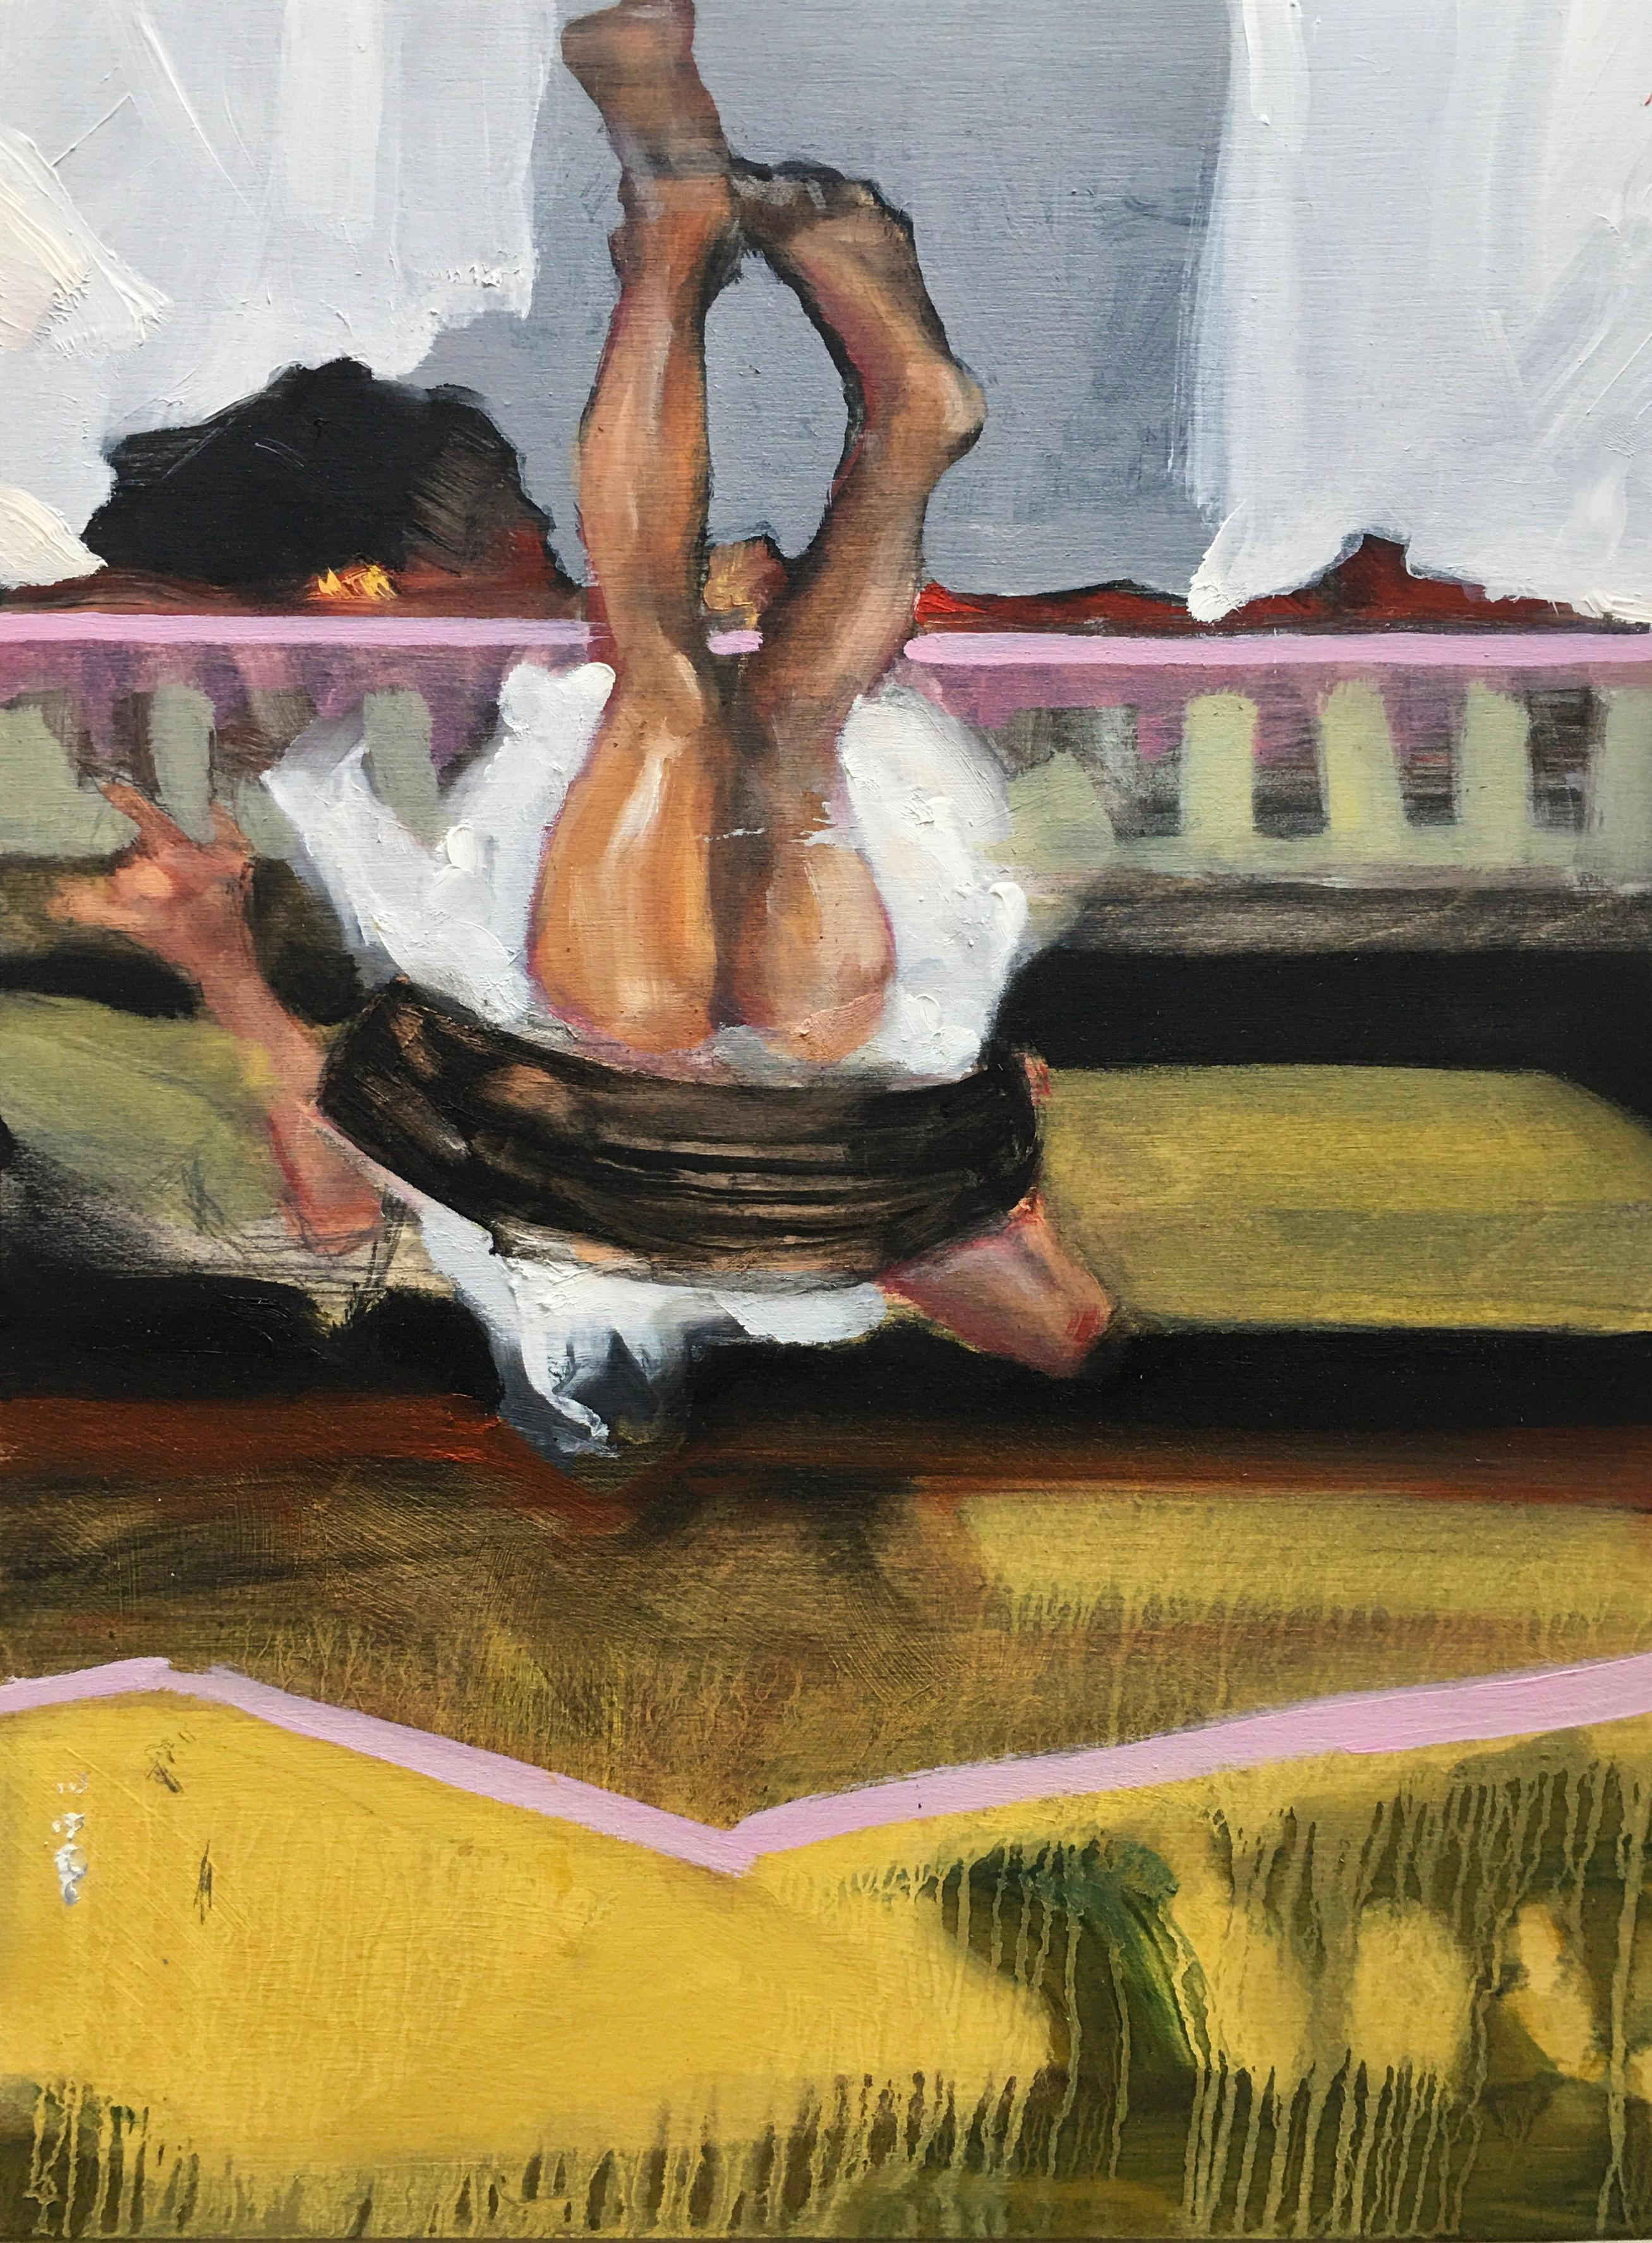 """Swing"", oil painting, figurative, play, barefoot, yard, upside down, legs"